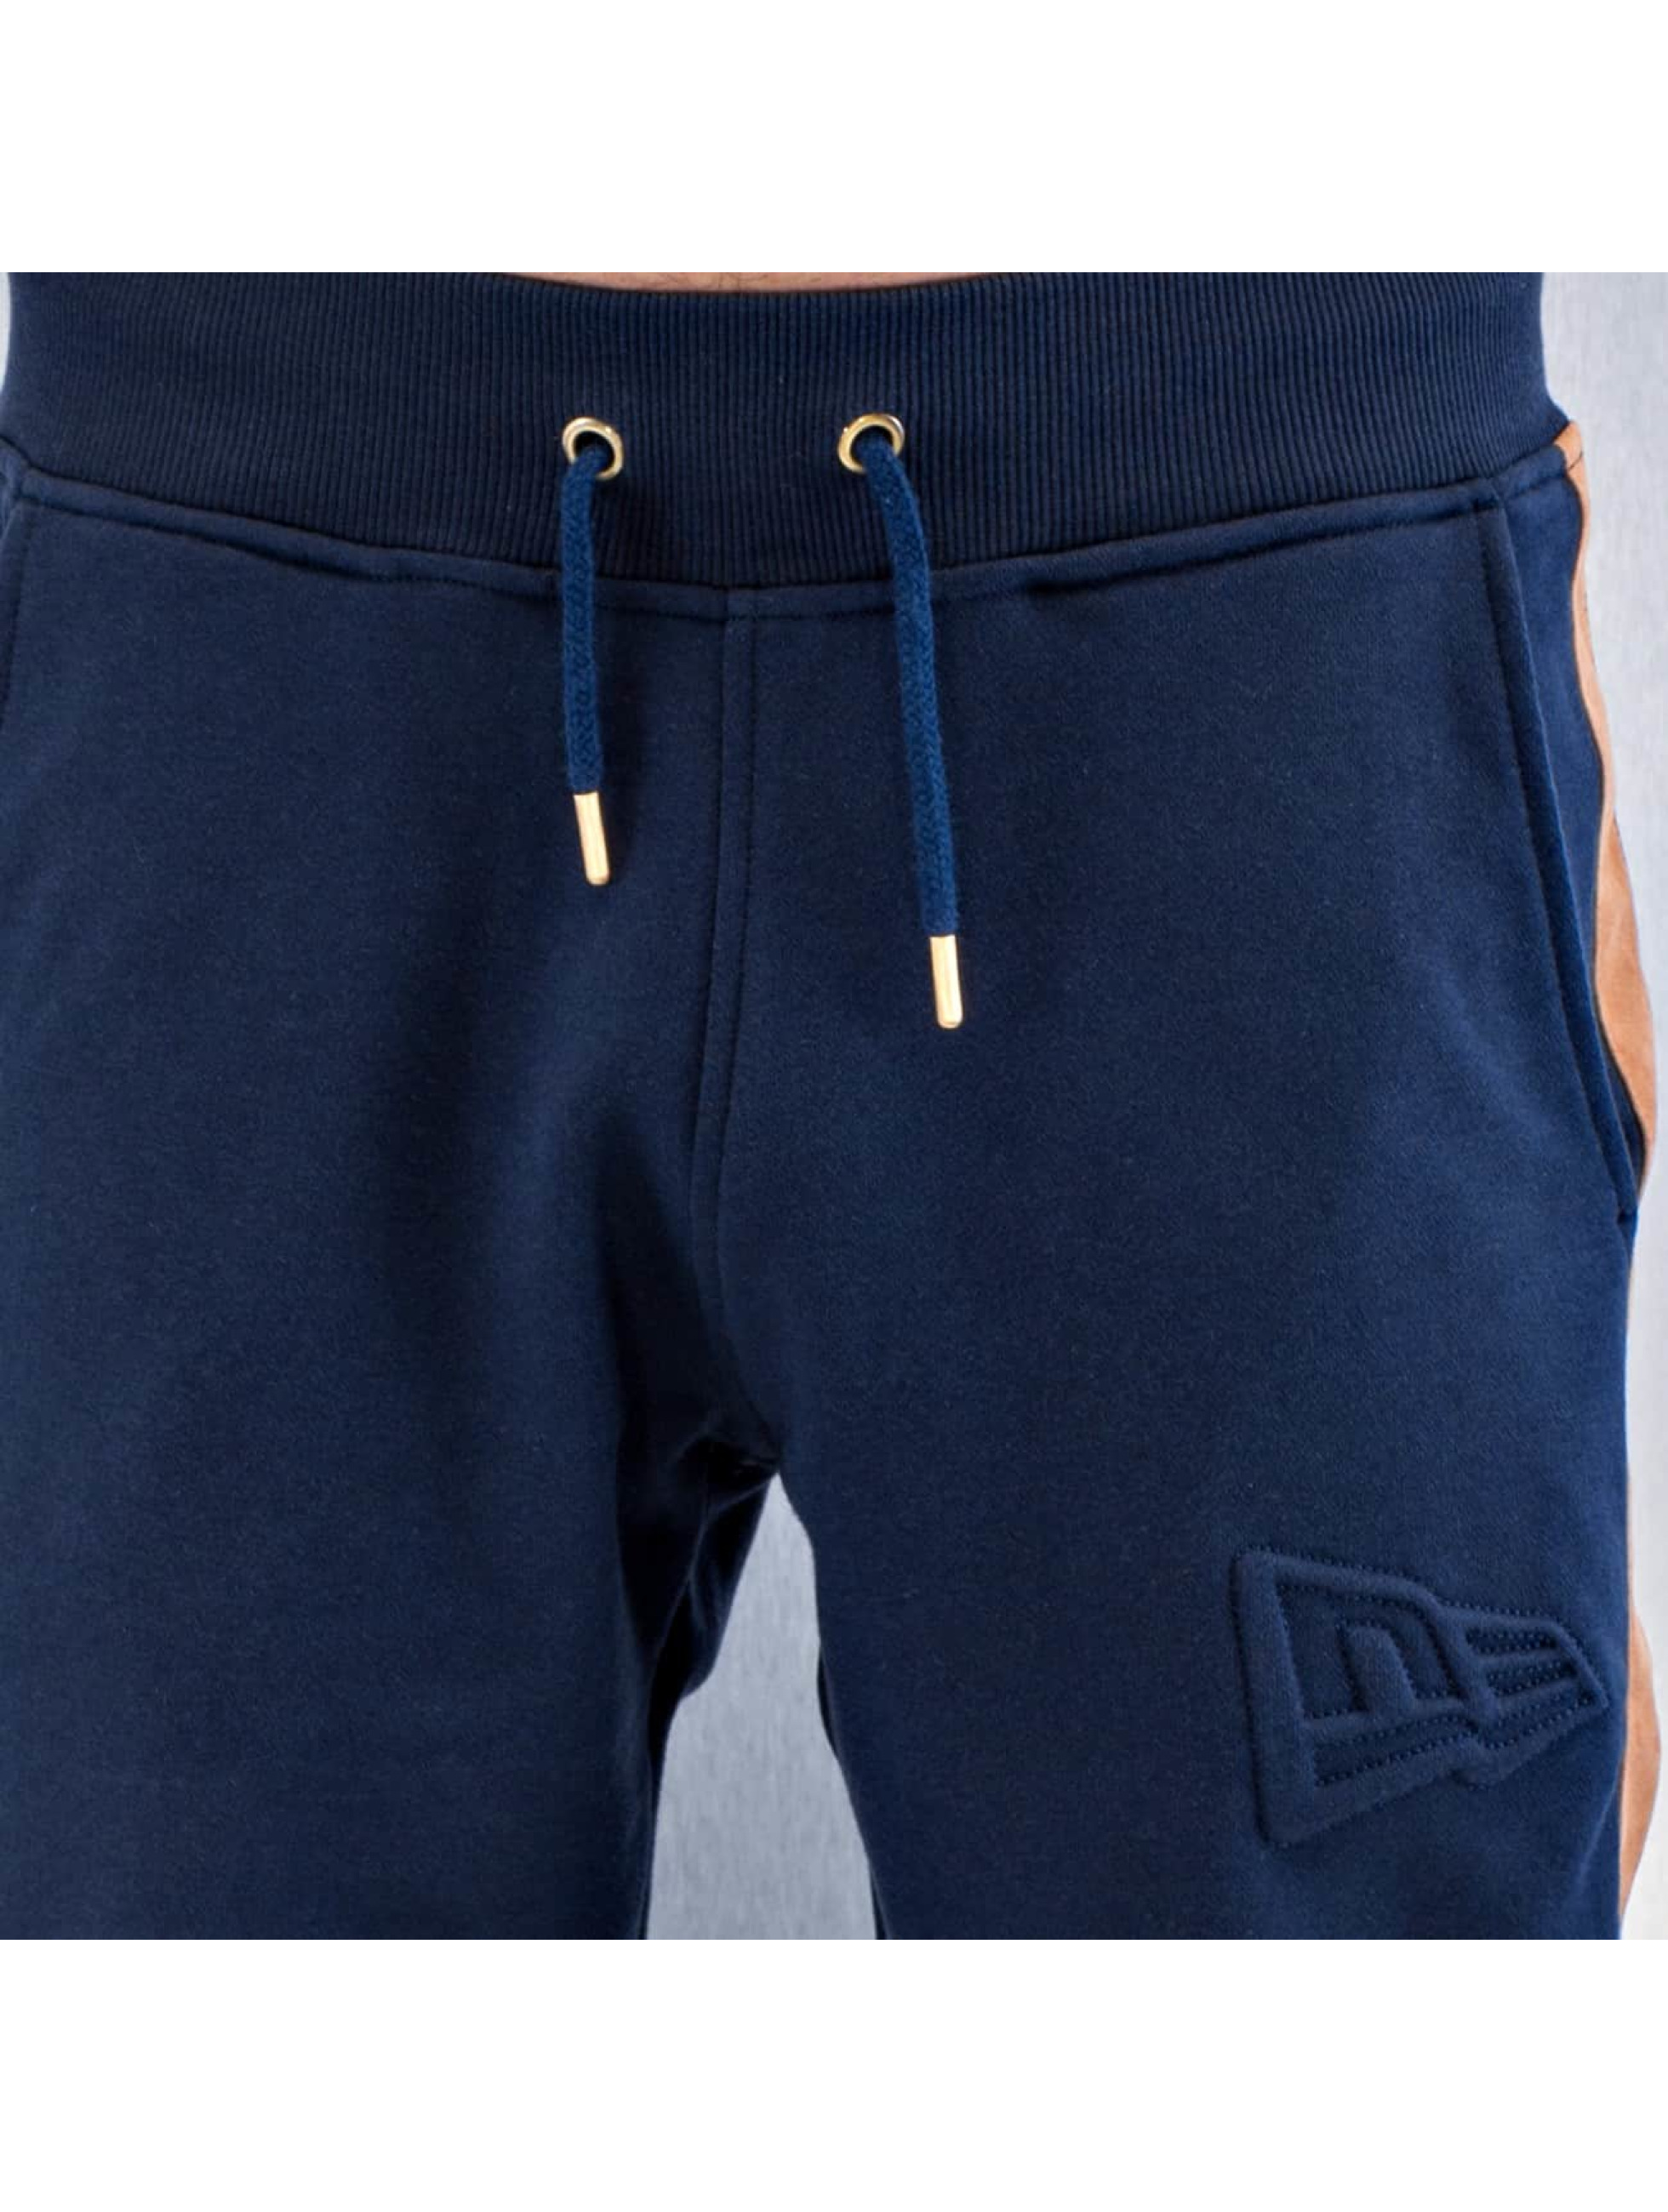 New Era joggingbroek Crafted blauw